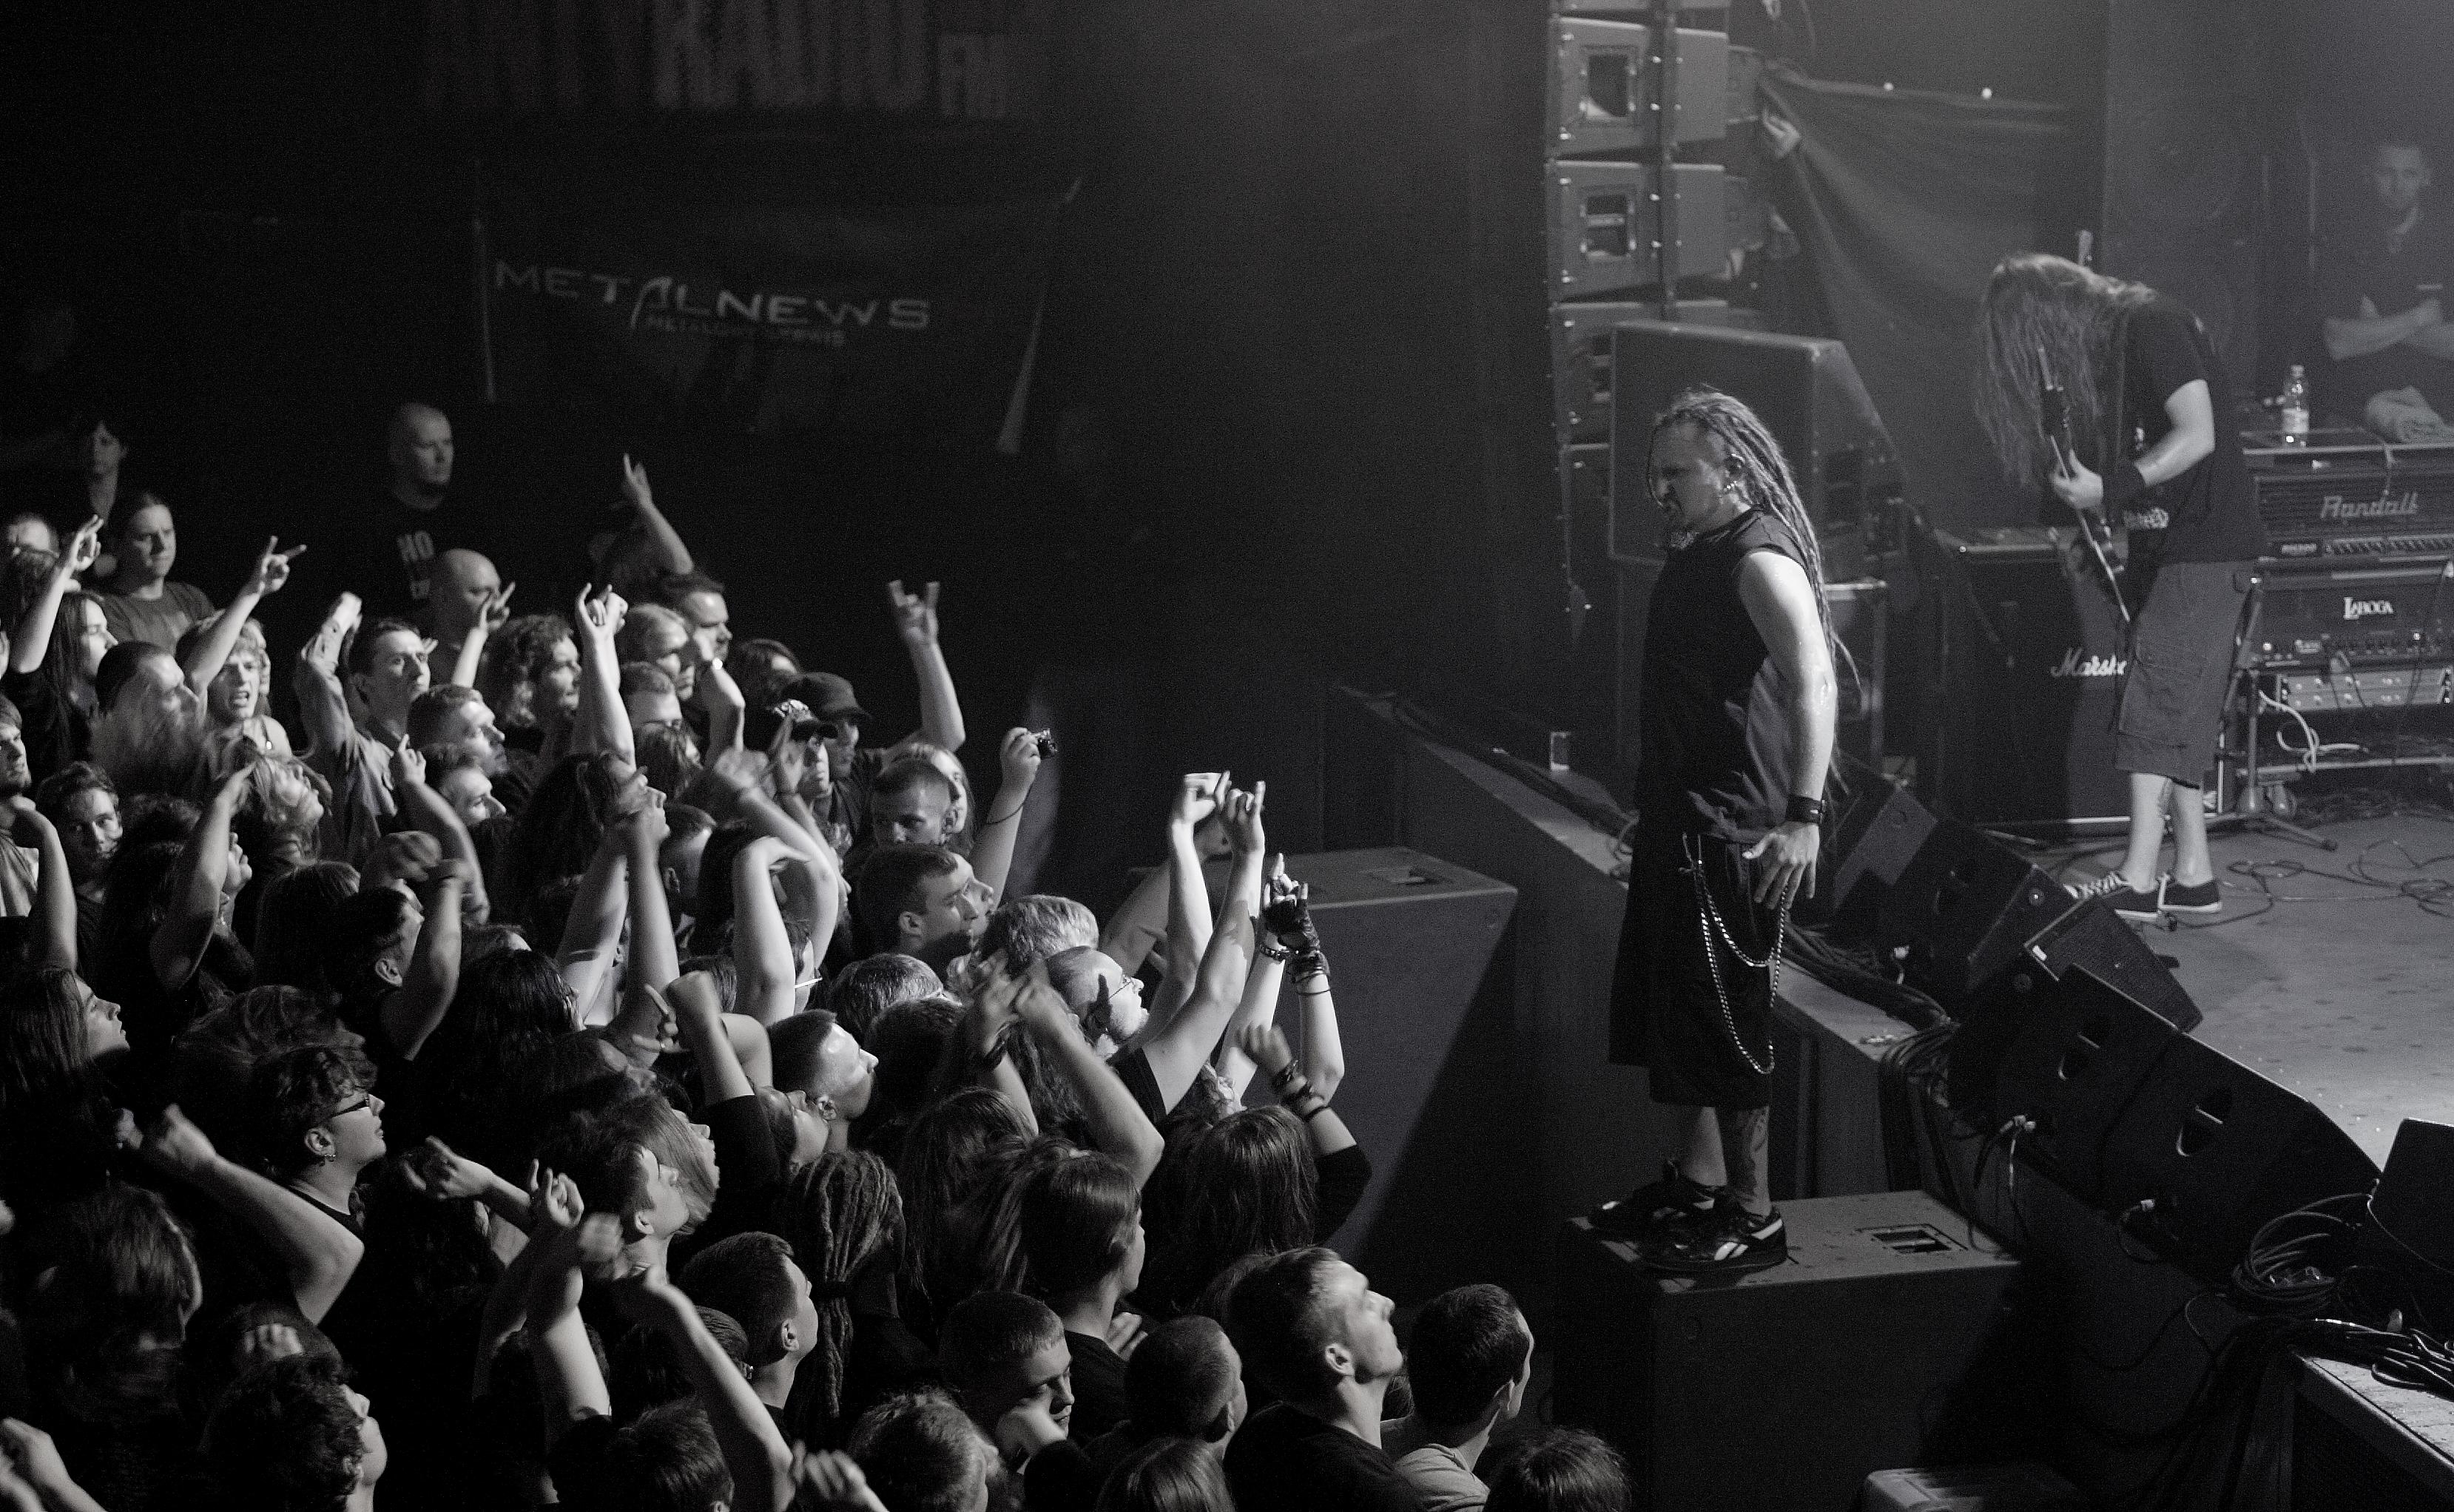 decapitated_live__klub_studio_krakow_poland_june_5th_2012